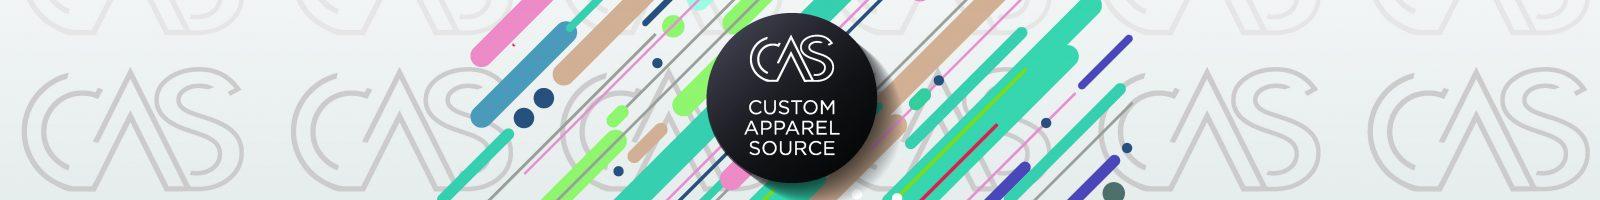 Custom Apparel Source - Global Custom Apparel and Marketing